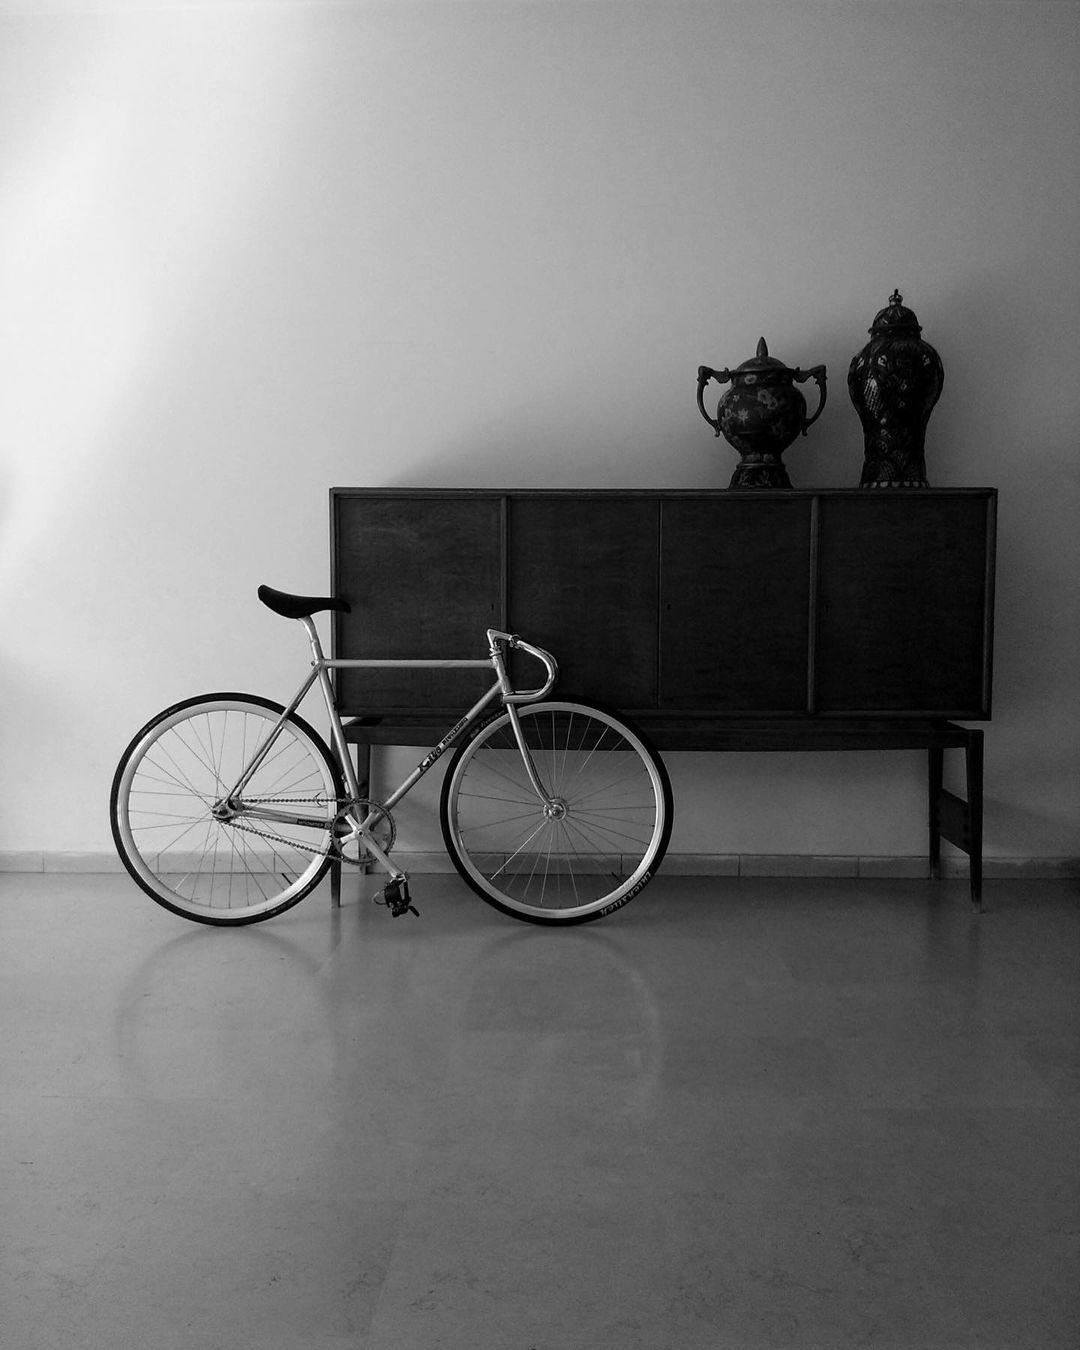 Bici fixie con mobili d'epoca